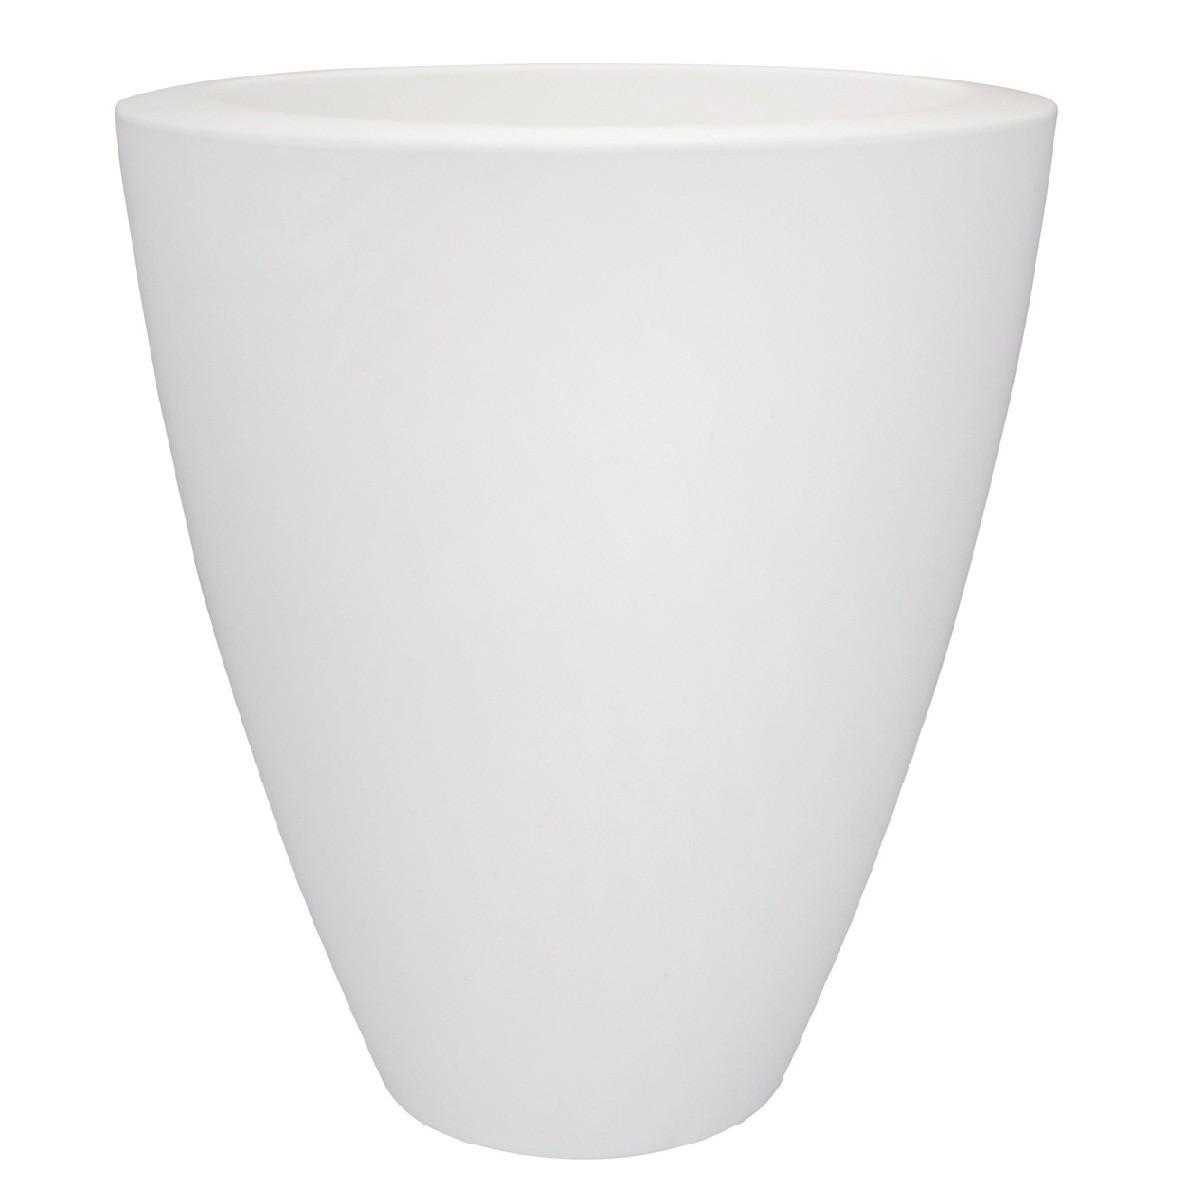 Pot de fleurs Pure High Ovale Blanc Ø 70